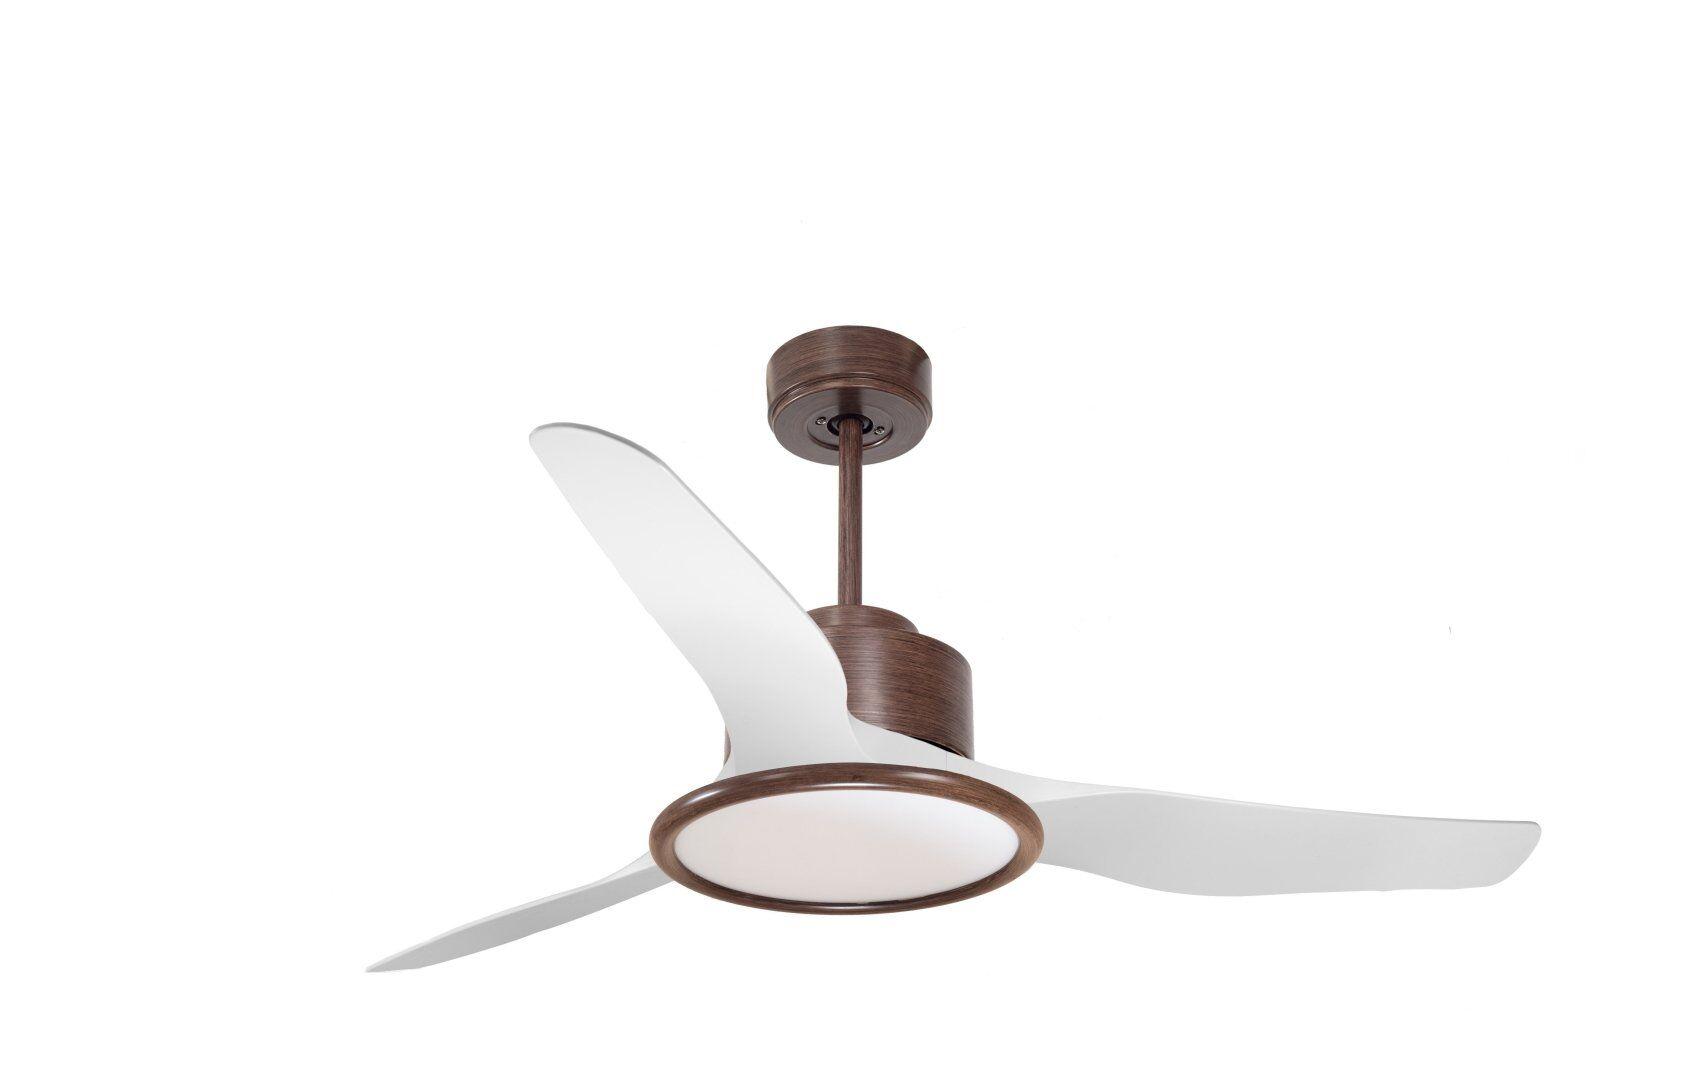 KlassFan Modulo by KlassFan - Super air destratification fan, Light,  White lacquered and wood, for 25 to 40 m² KL_DC200_P4Wo_L2Wo